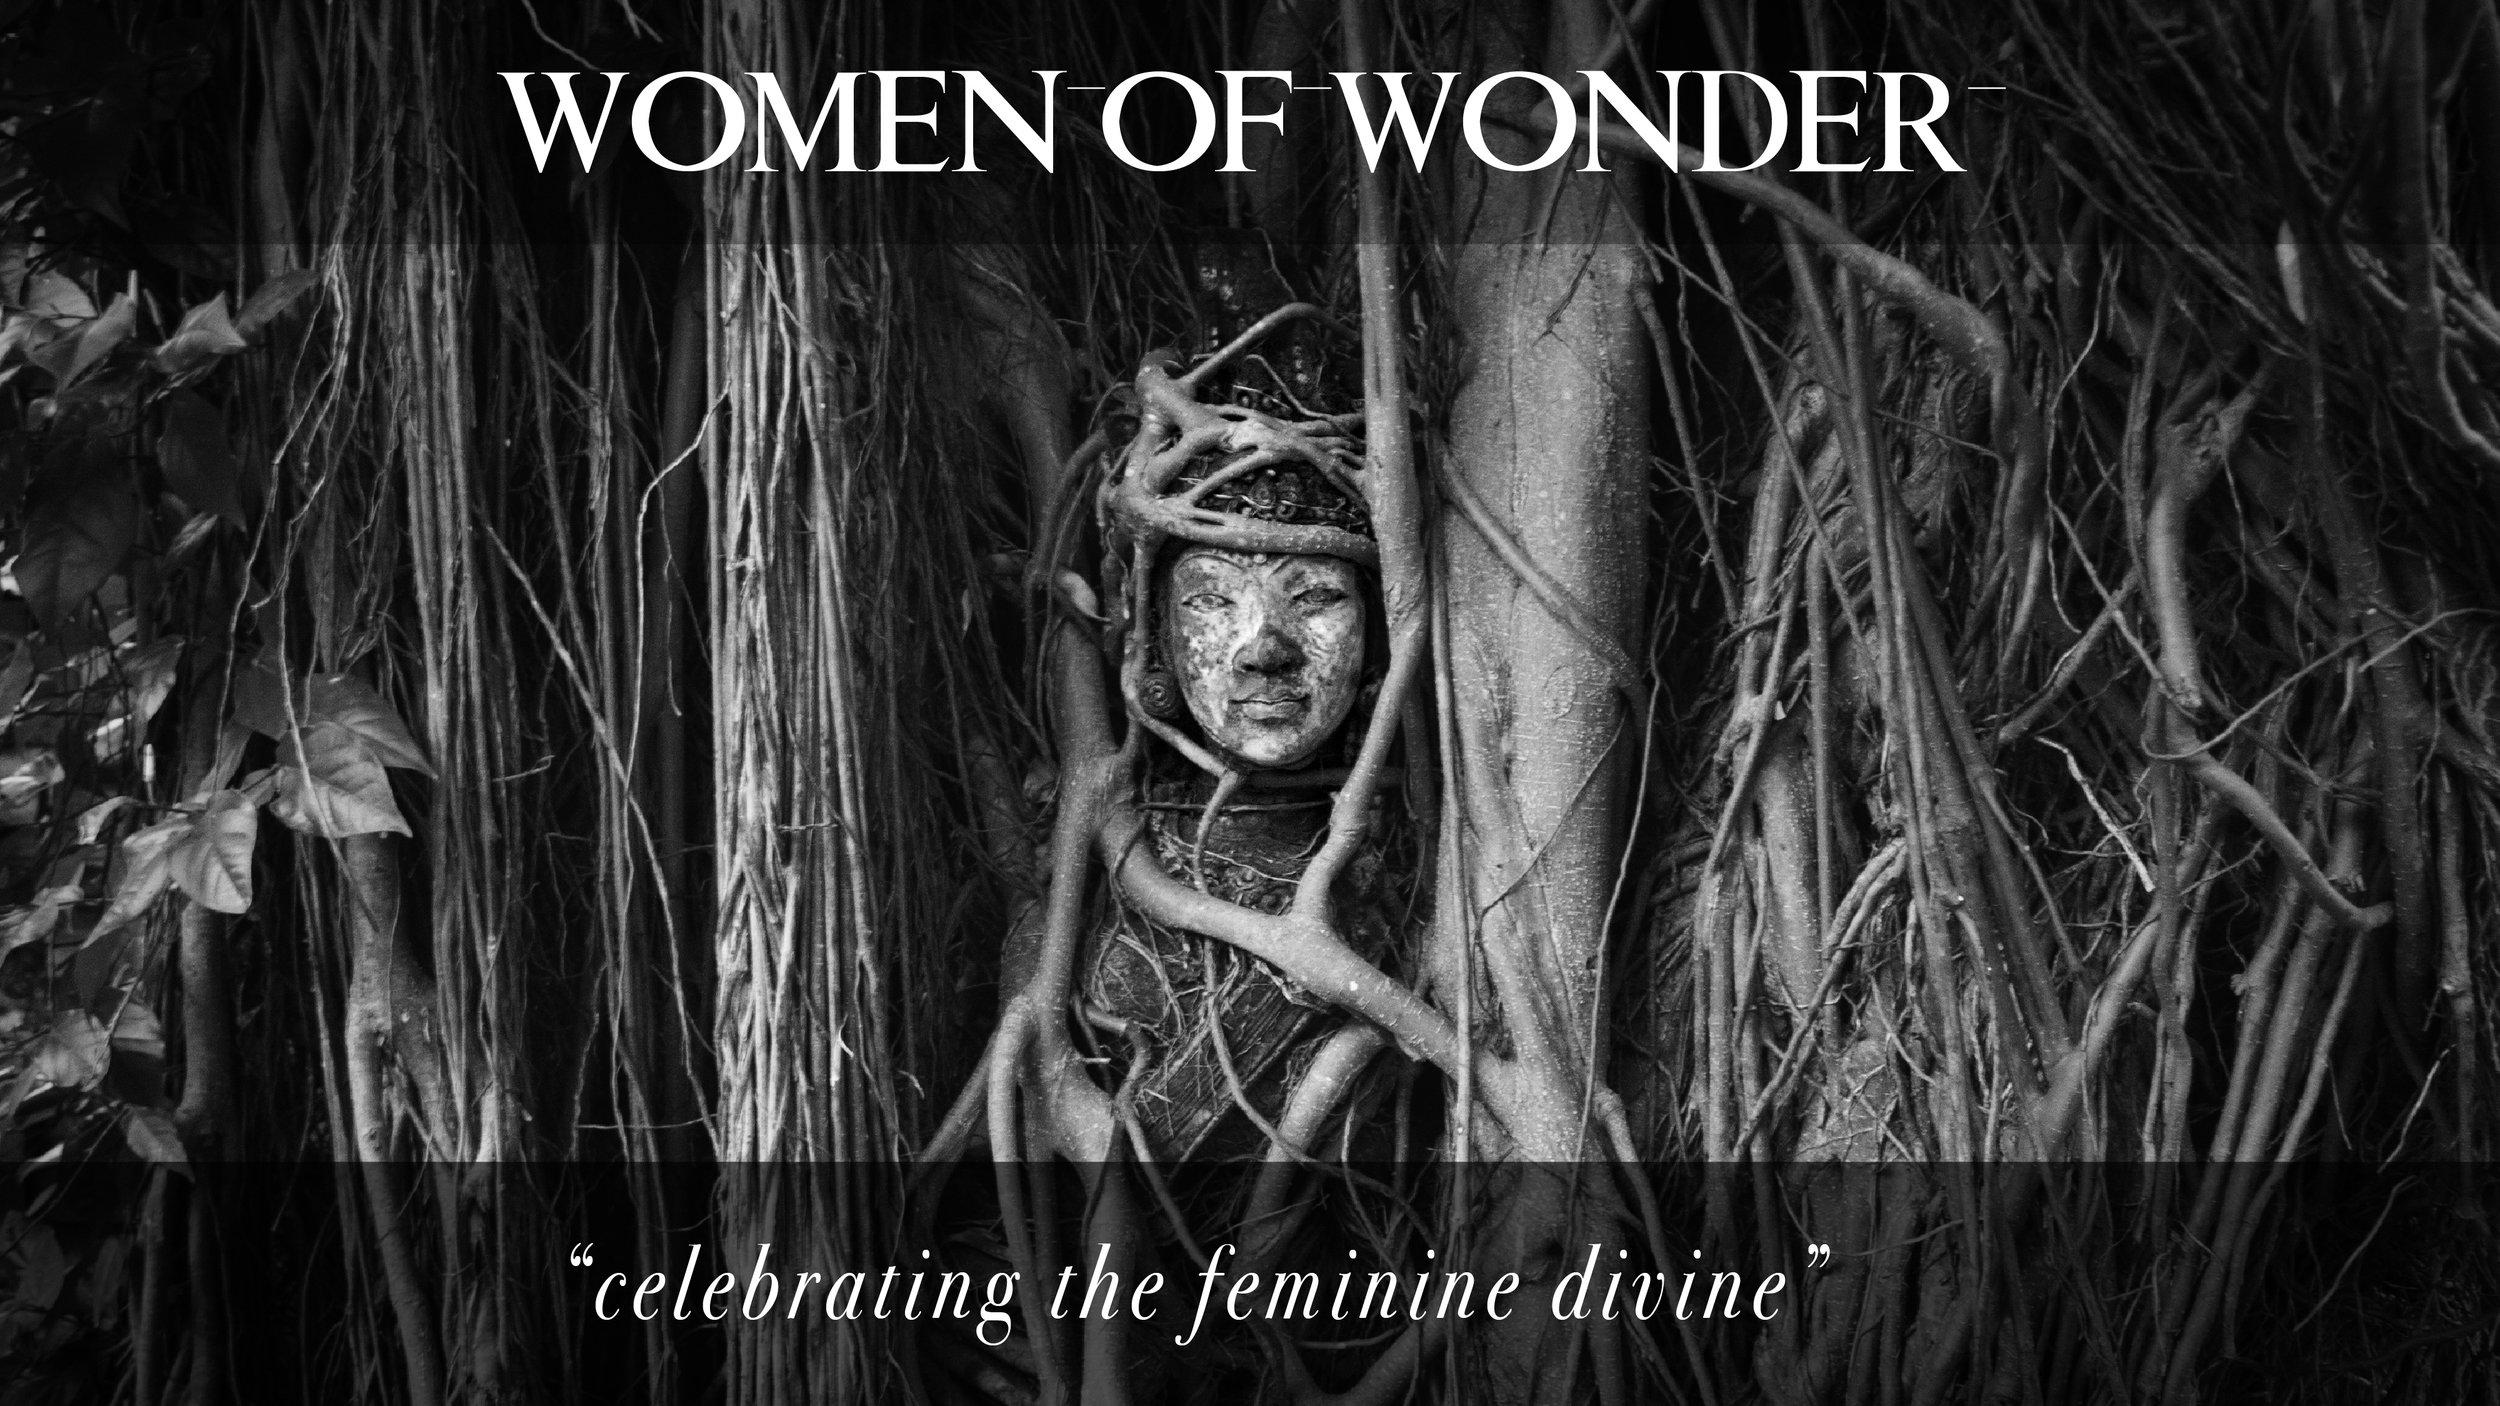 Women of Wonder - Coffee table book